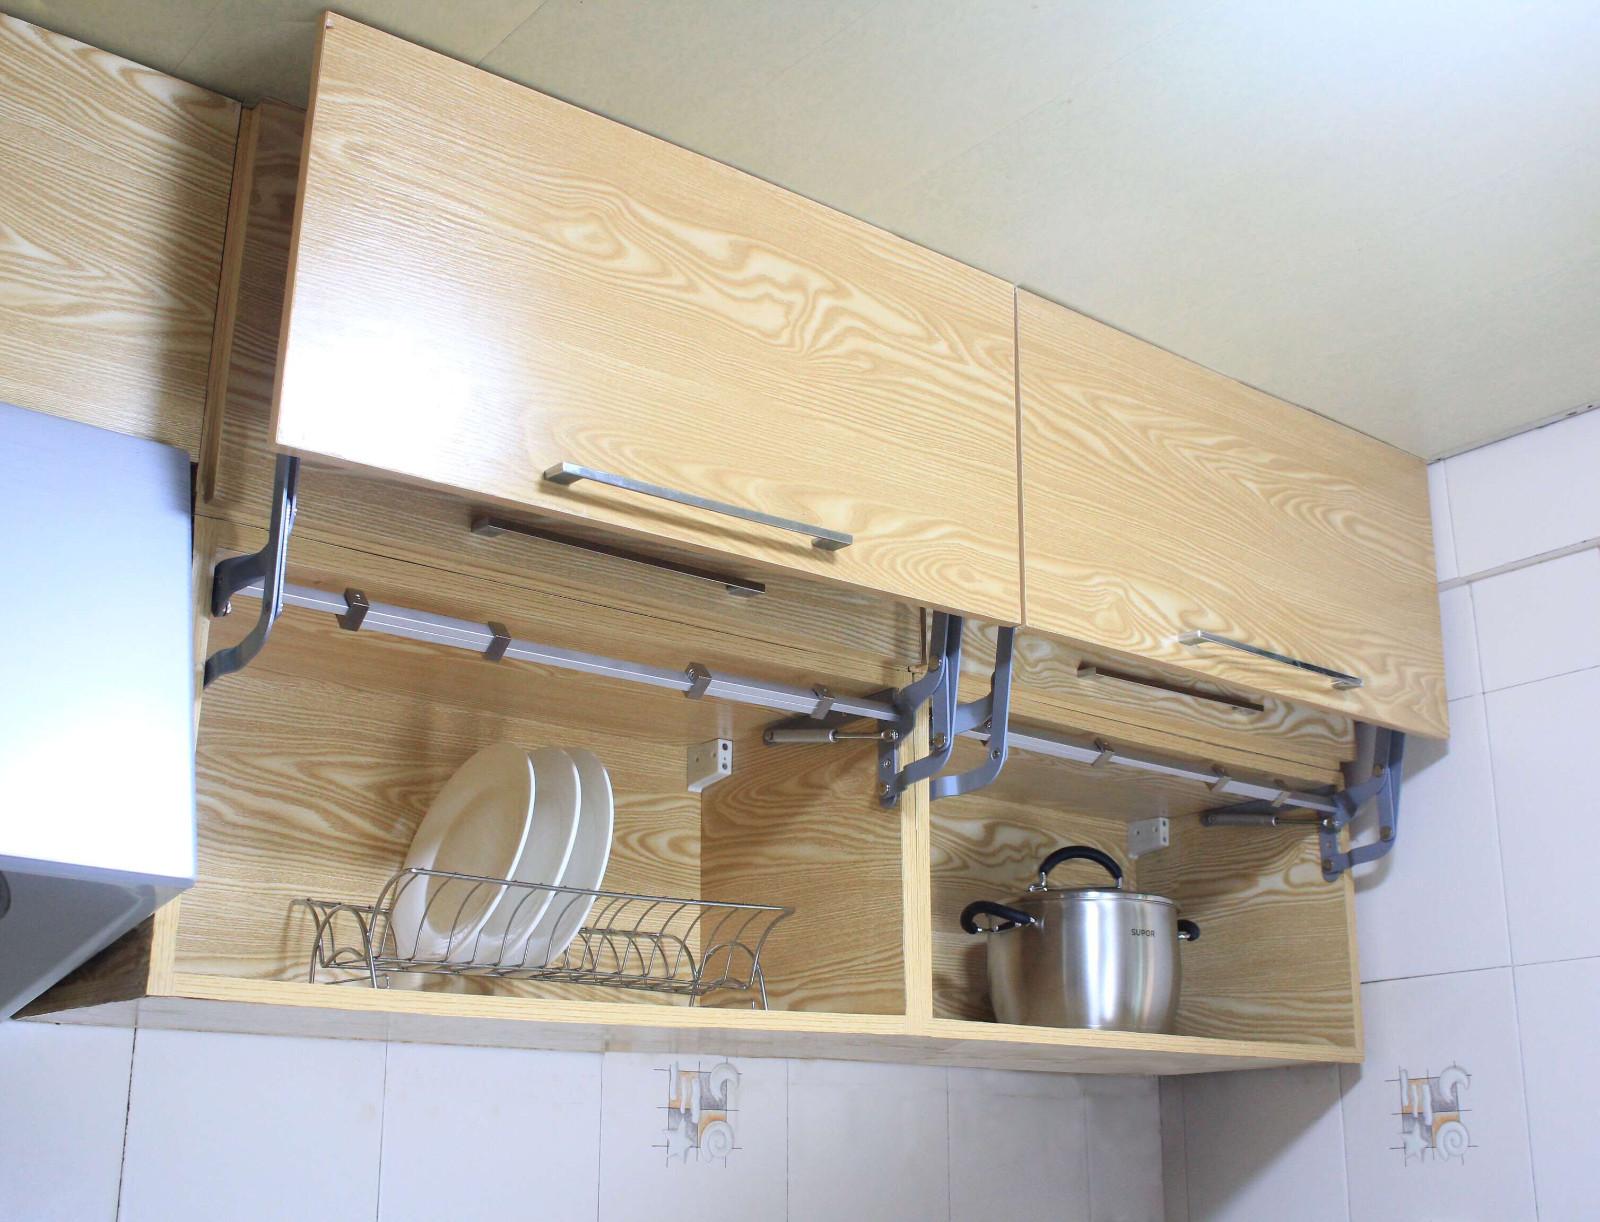 US Hanging Cabinet Door Vertical Swing Lift Up Stay Pneumatic Arm ...